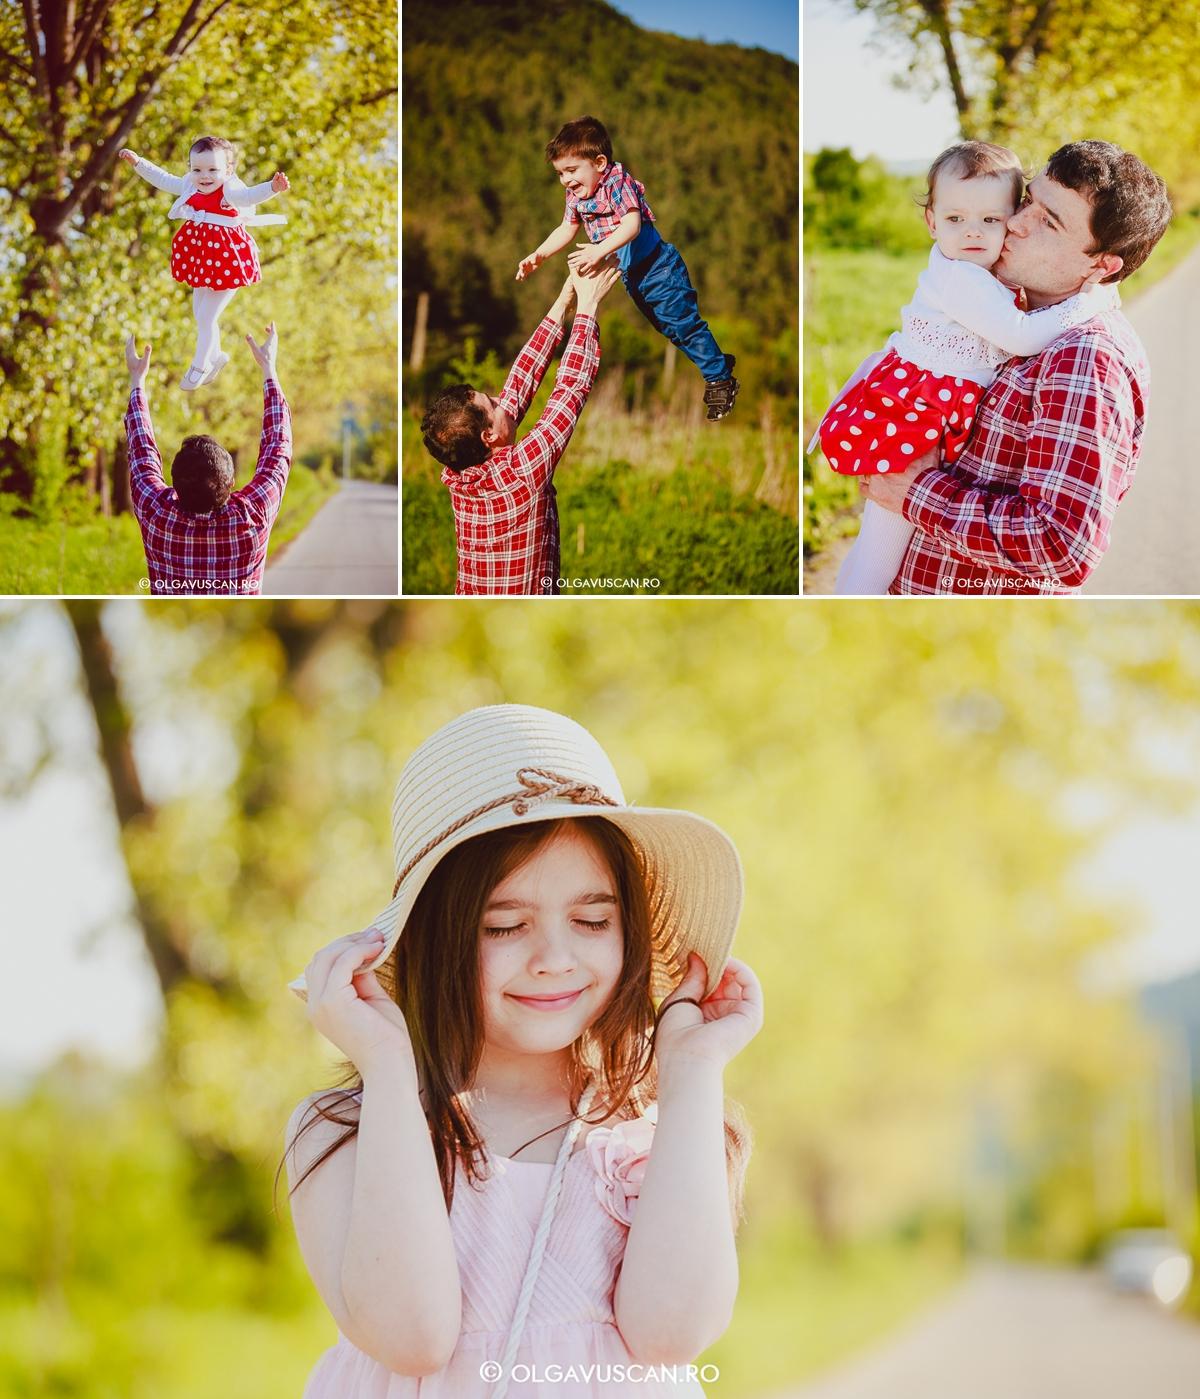 sedinta foto familie in natura, sesiune foto afara, fotograf profesionist familie, fotograf copii Cluj, fotograf Cluj